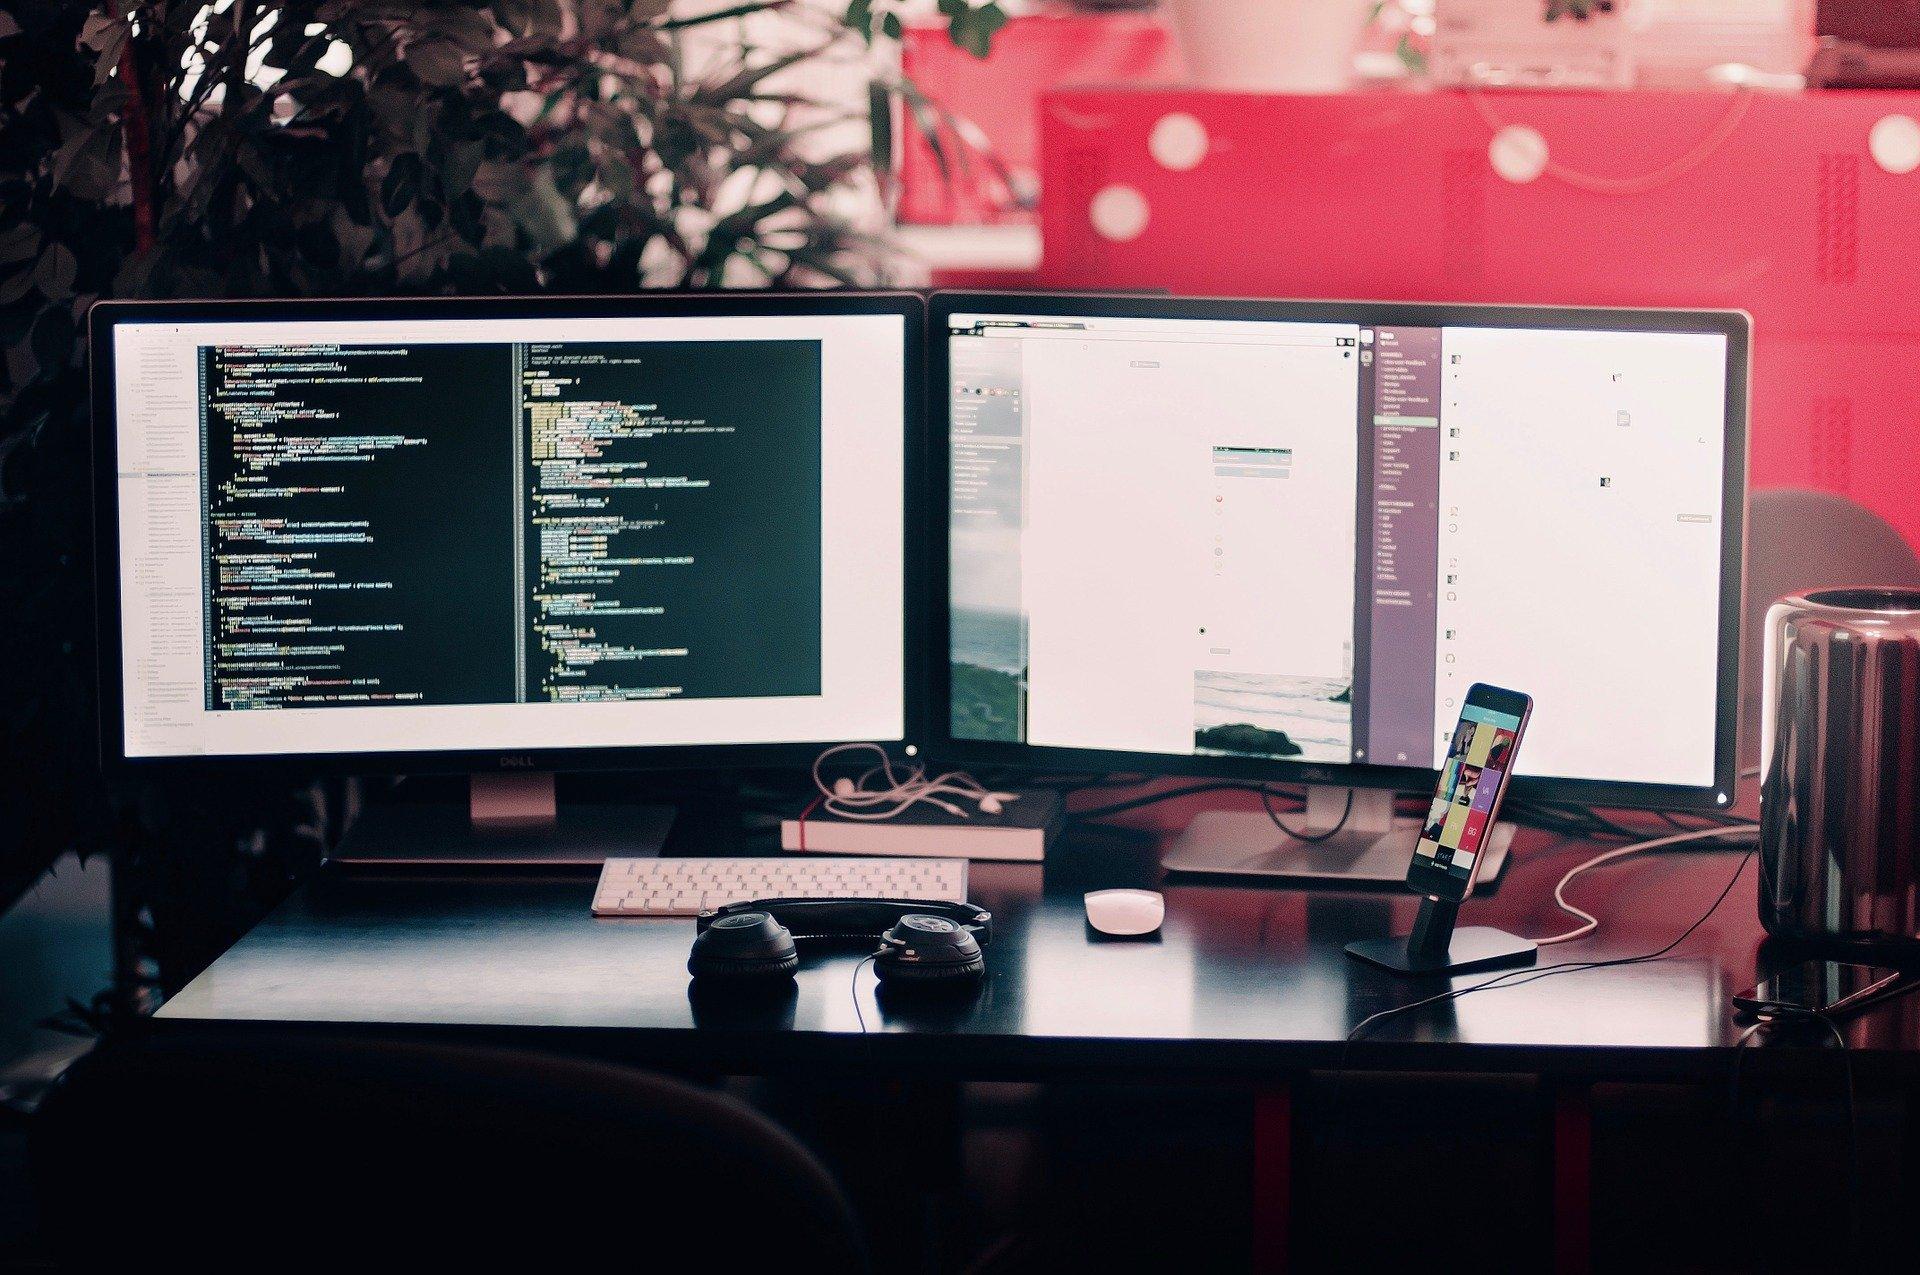 find similar code using NLP on software documentation